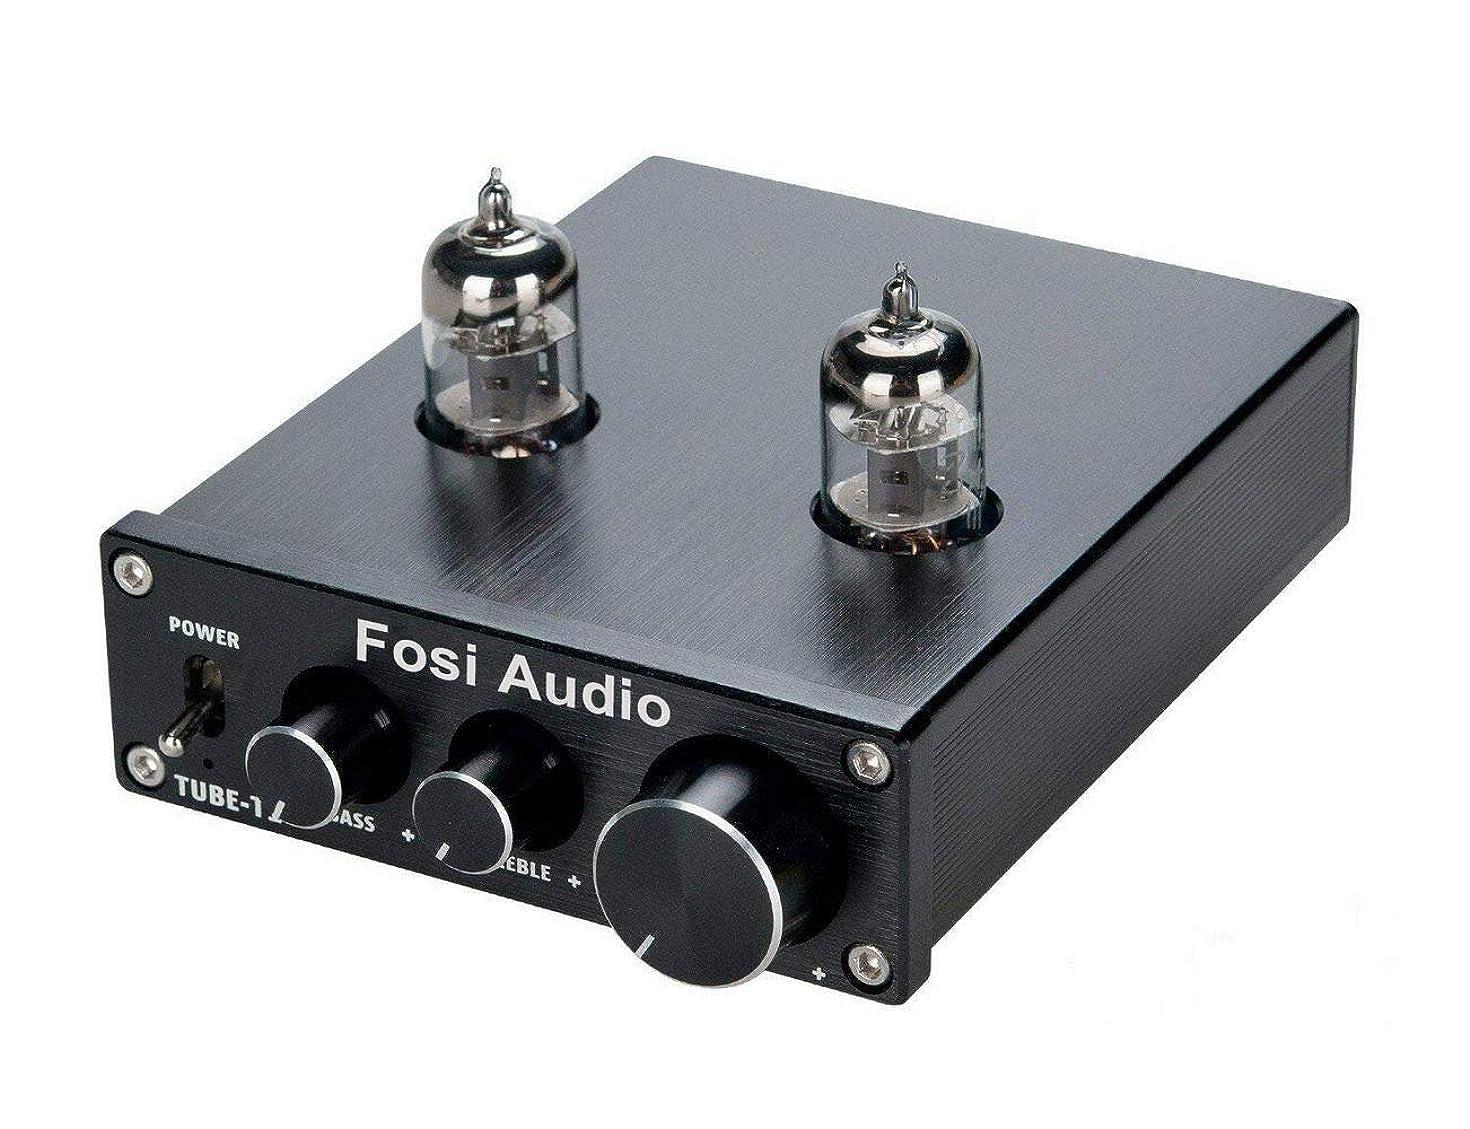 Fosi Audio P1 Tube Pre-Amplifier Mini Hi-Fi Stereo Buffer Preamp 6J1 Valve & Vacuum Pre-amp with Treble & Bass Tone Control for Home Theater System